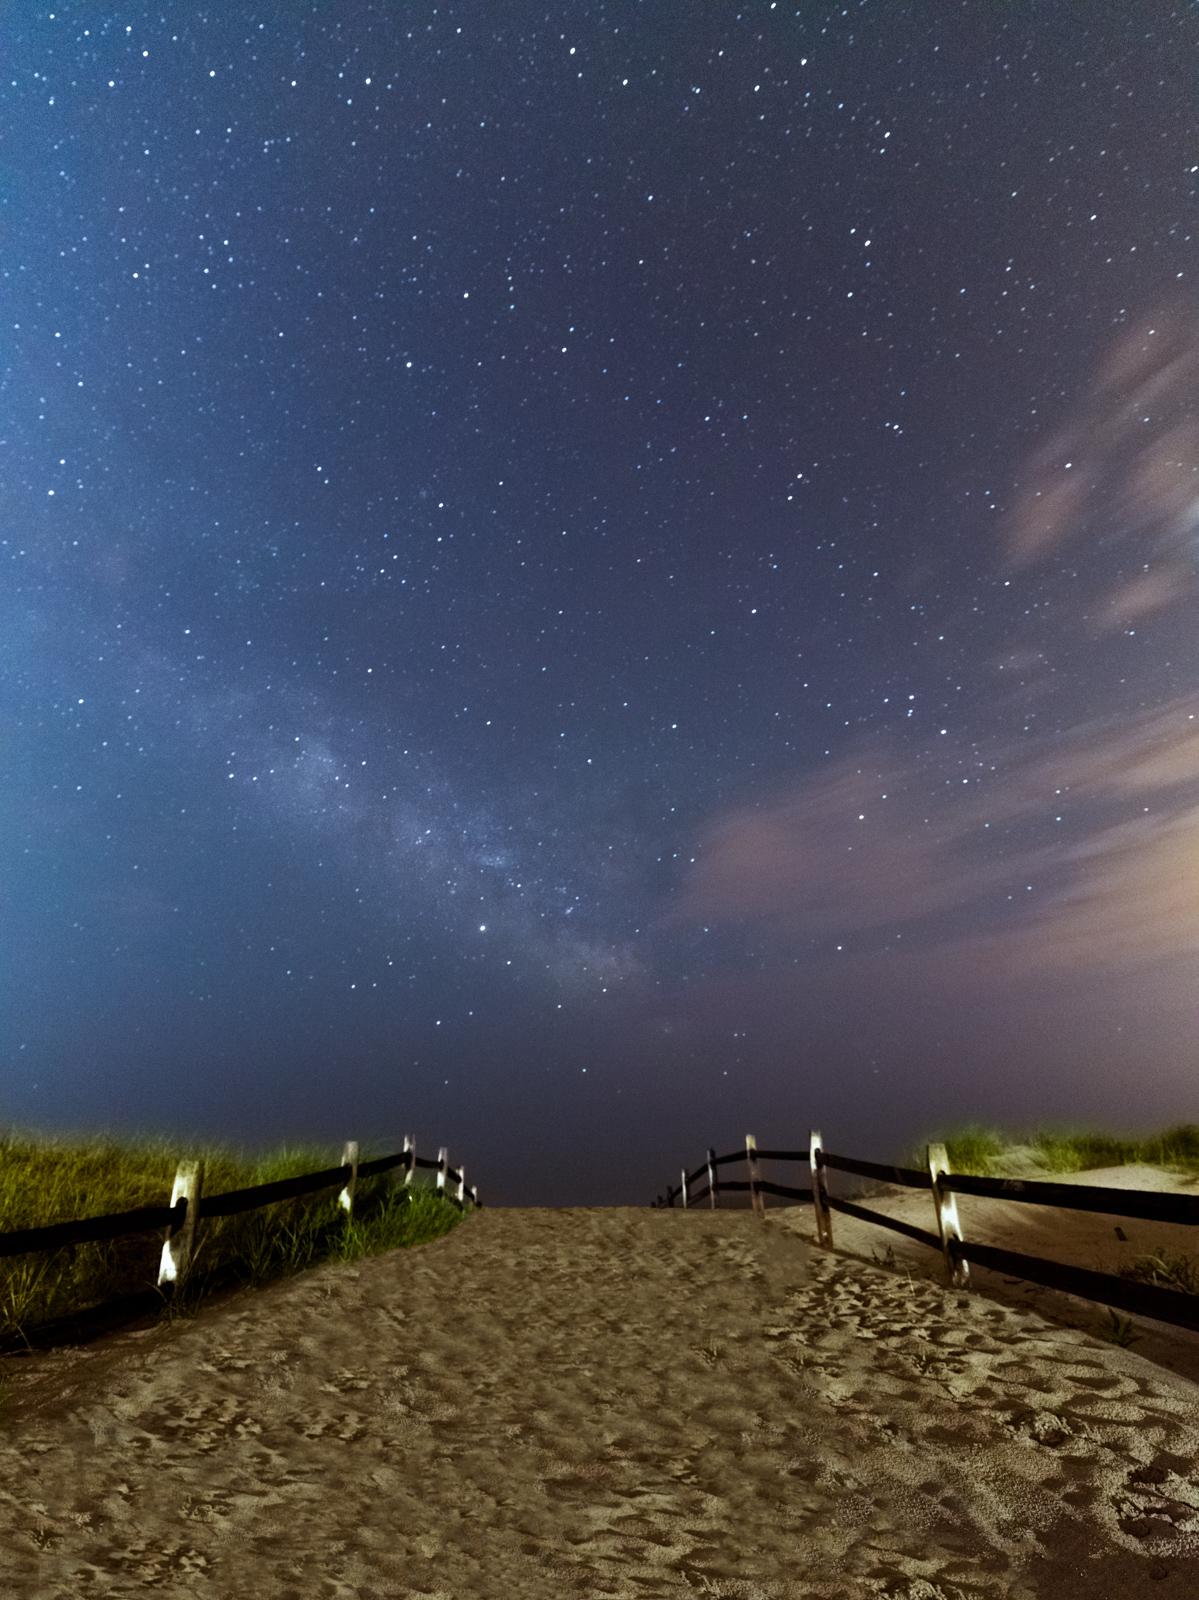 hassleblad_night_typoland_landscape.jpg